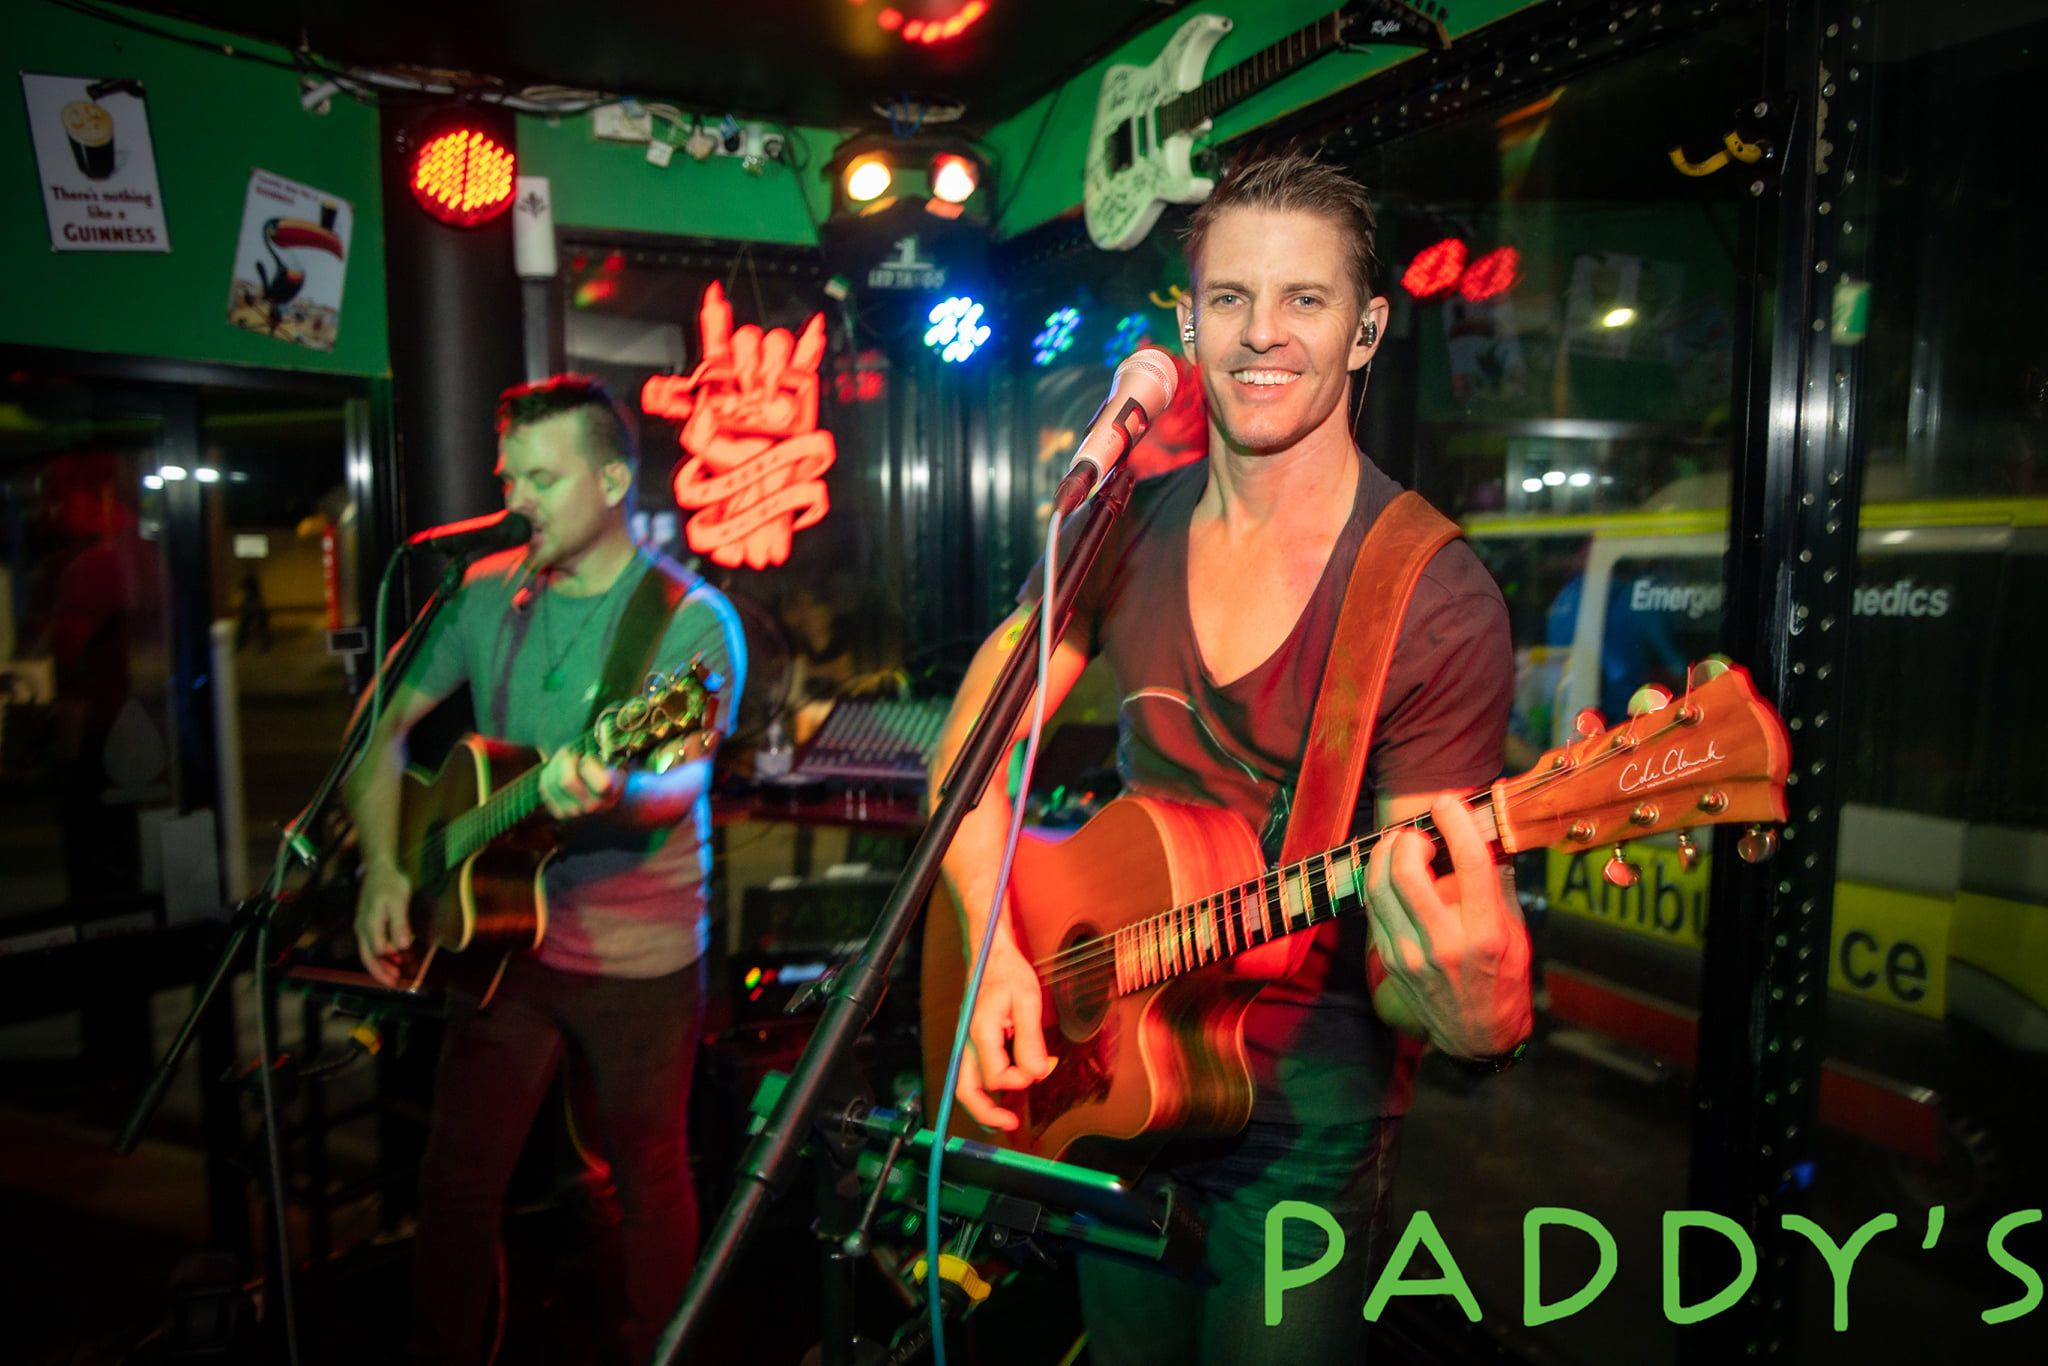 Paddy's shenanigans live music